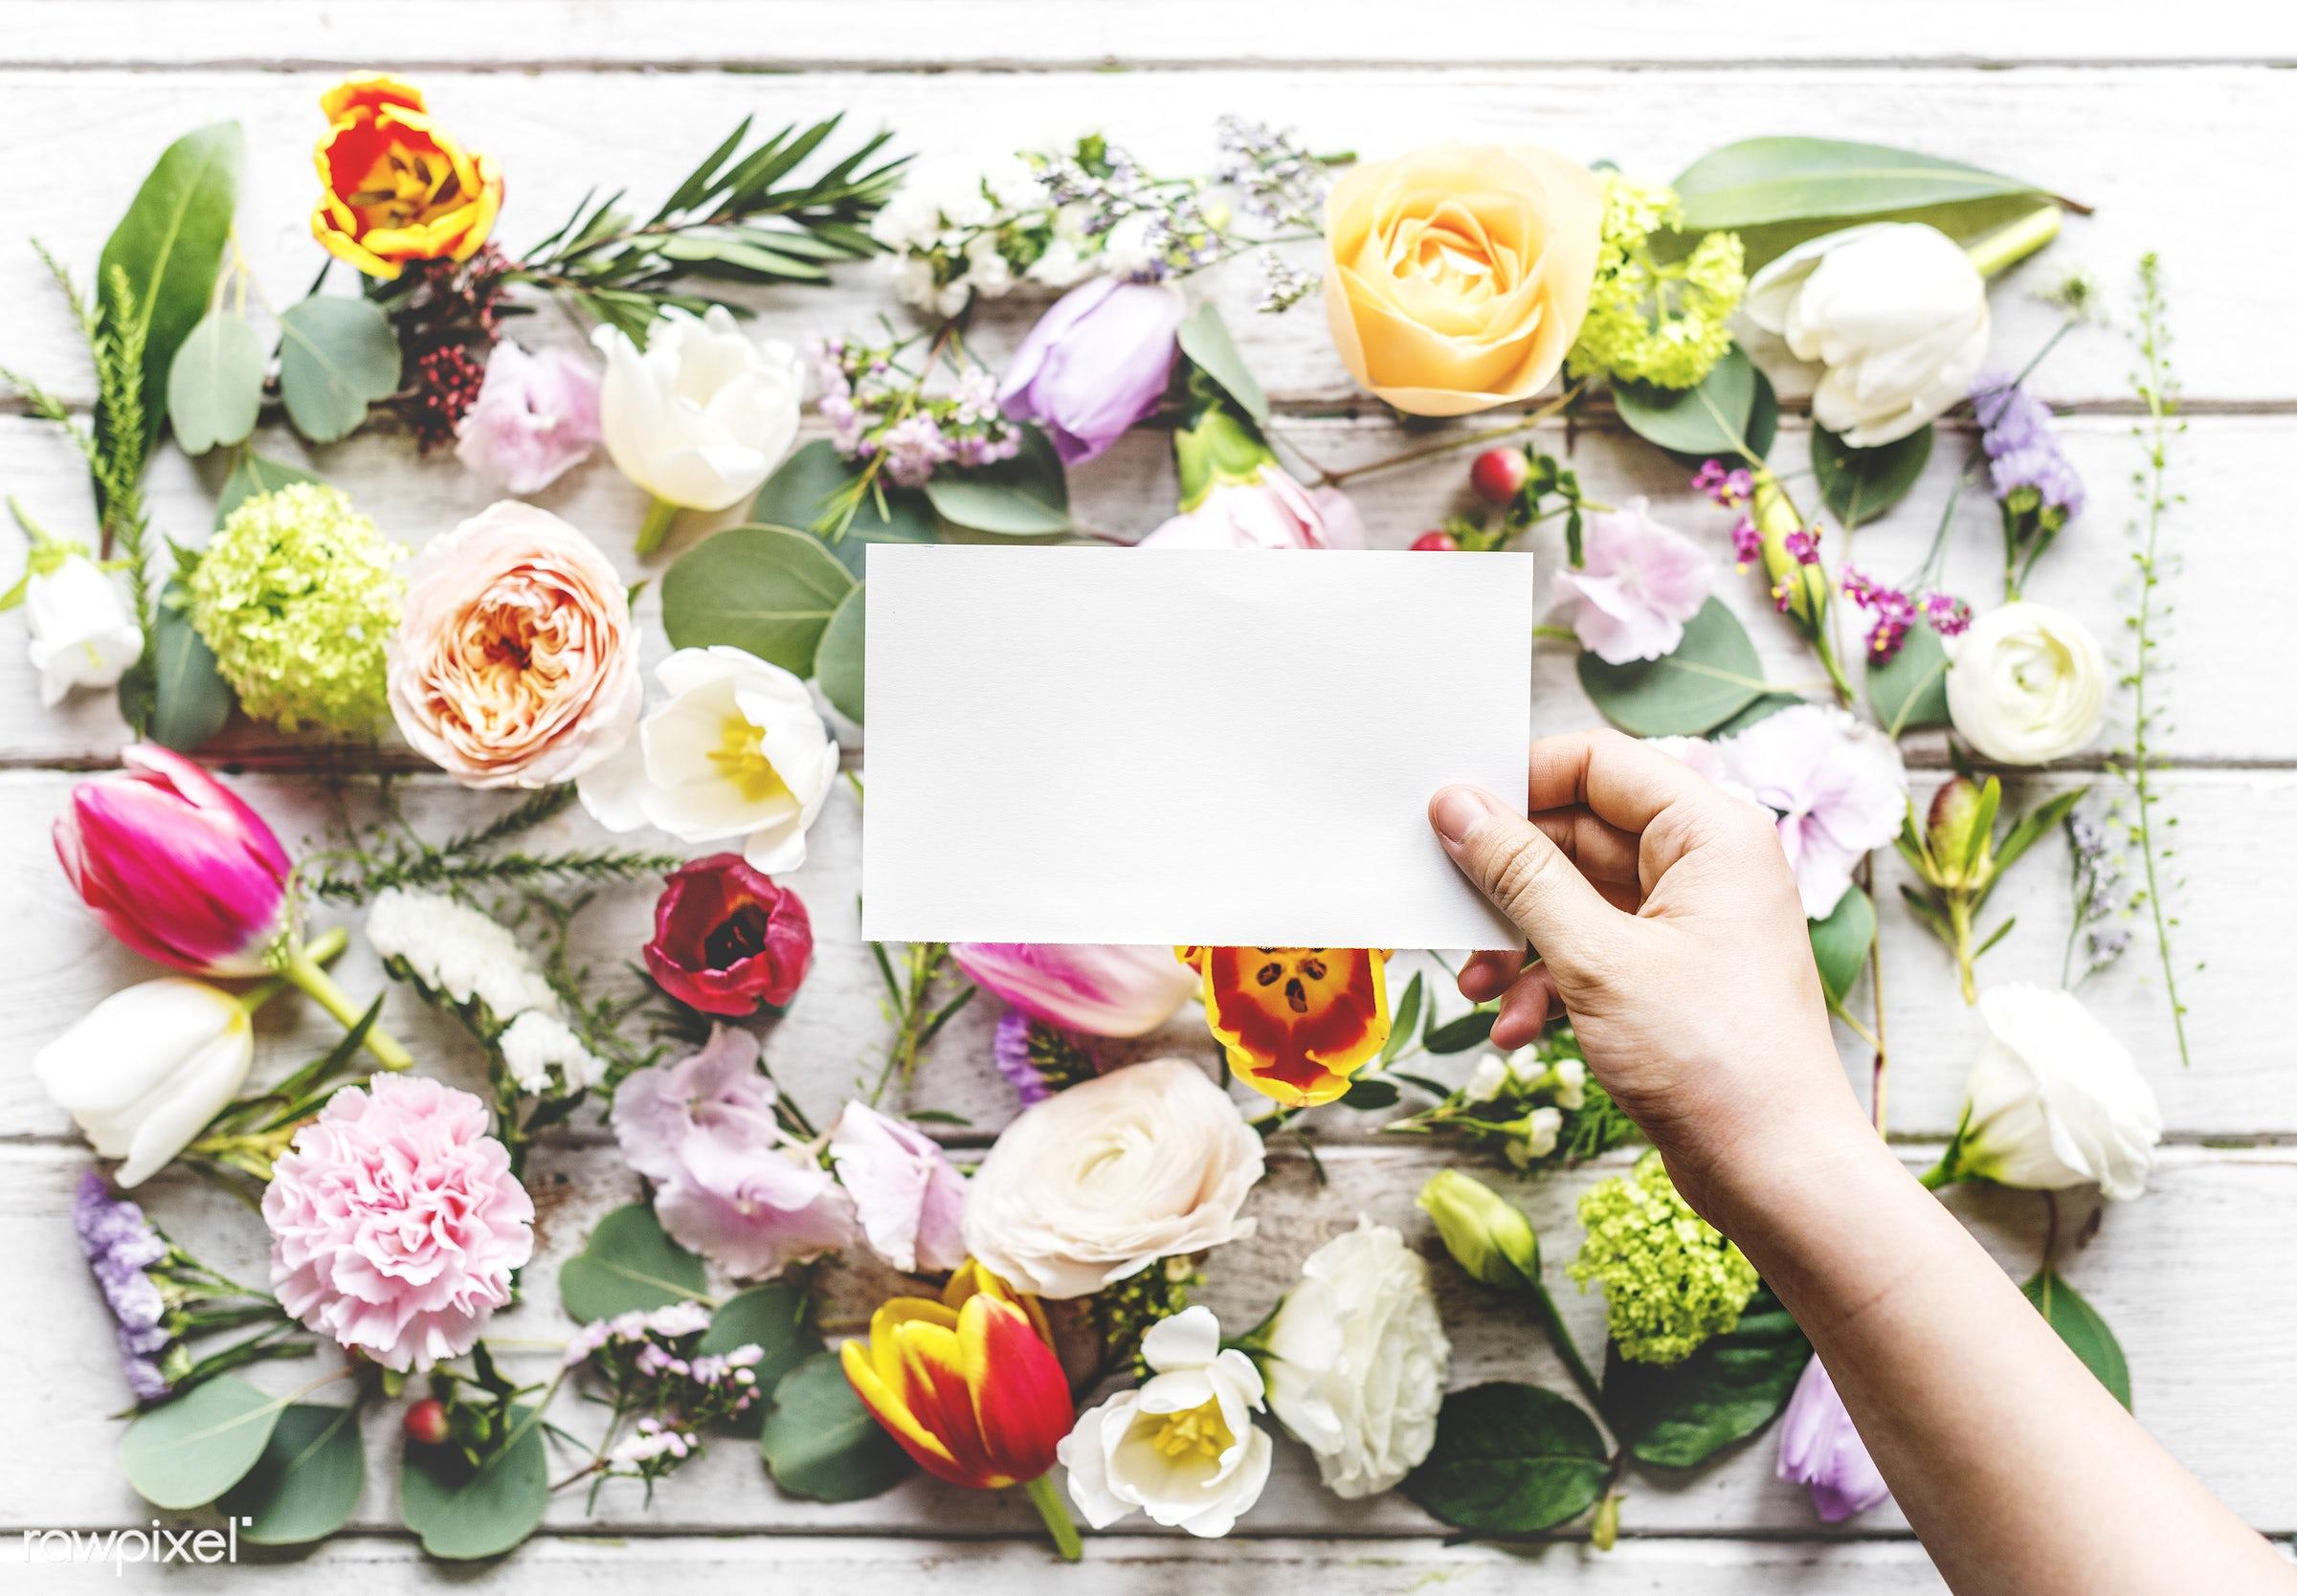 aromatic, arrangement, art, beautiful, beauty, blank, bloom, blossom, collection, copy space, copyspace, craft, decorative,...